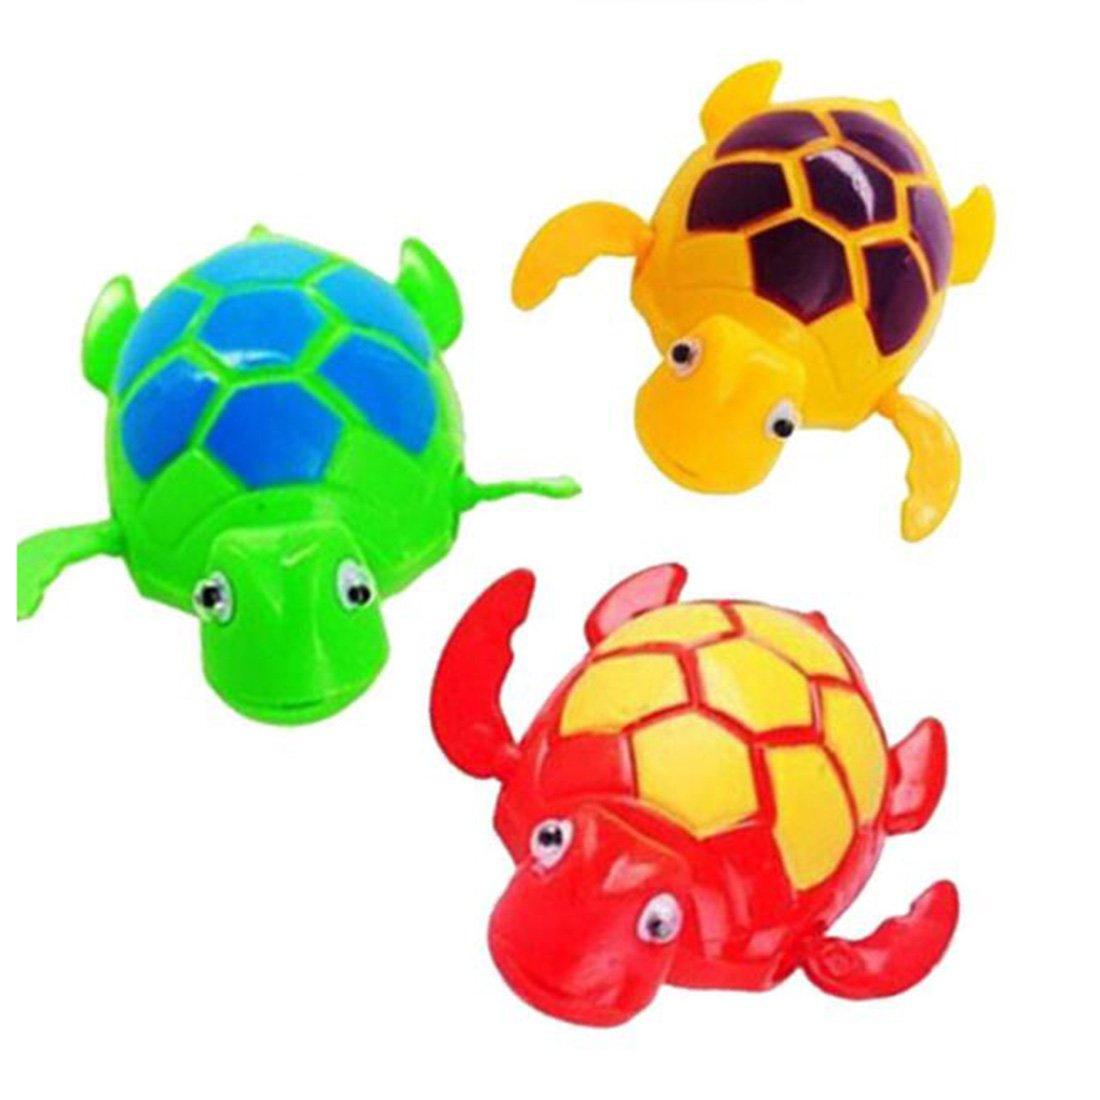 VHLL Hot Newborn Cartoon Animal Baby Bathroom Toys Swimming Turtle Wound-up Chain Clockwork Kids Classic Children Gift Plastic Toys